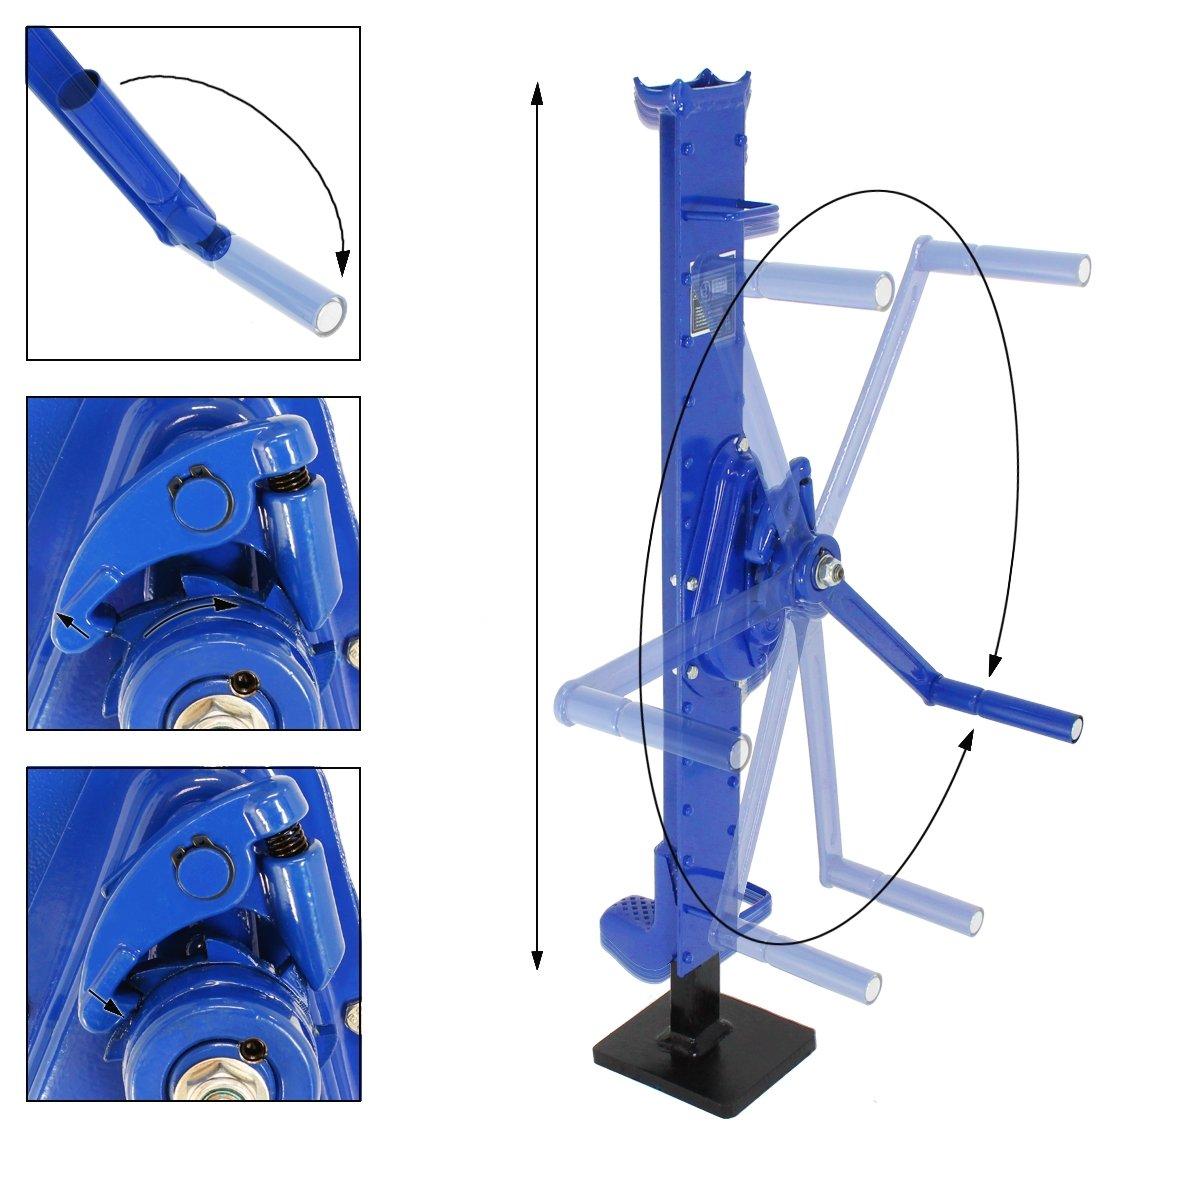 ECD Germany Gato mecánico con Cremallera en Acero 1,5 toneladas Elevador de Carga Extensible con manivela y asa de Transporte Base de Placa 14 cm x 13 cm: ...